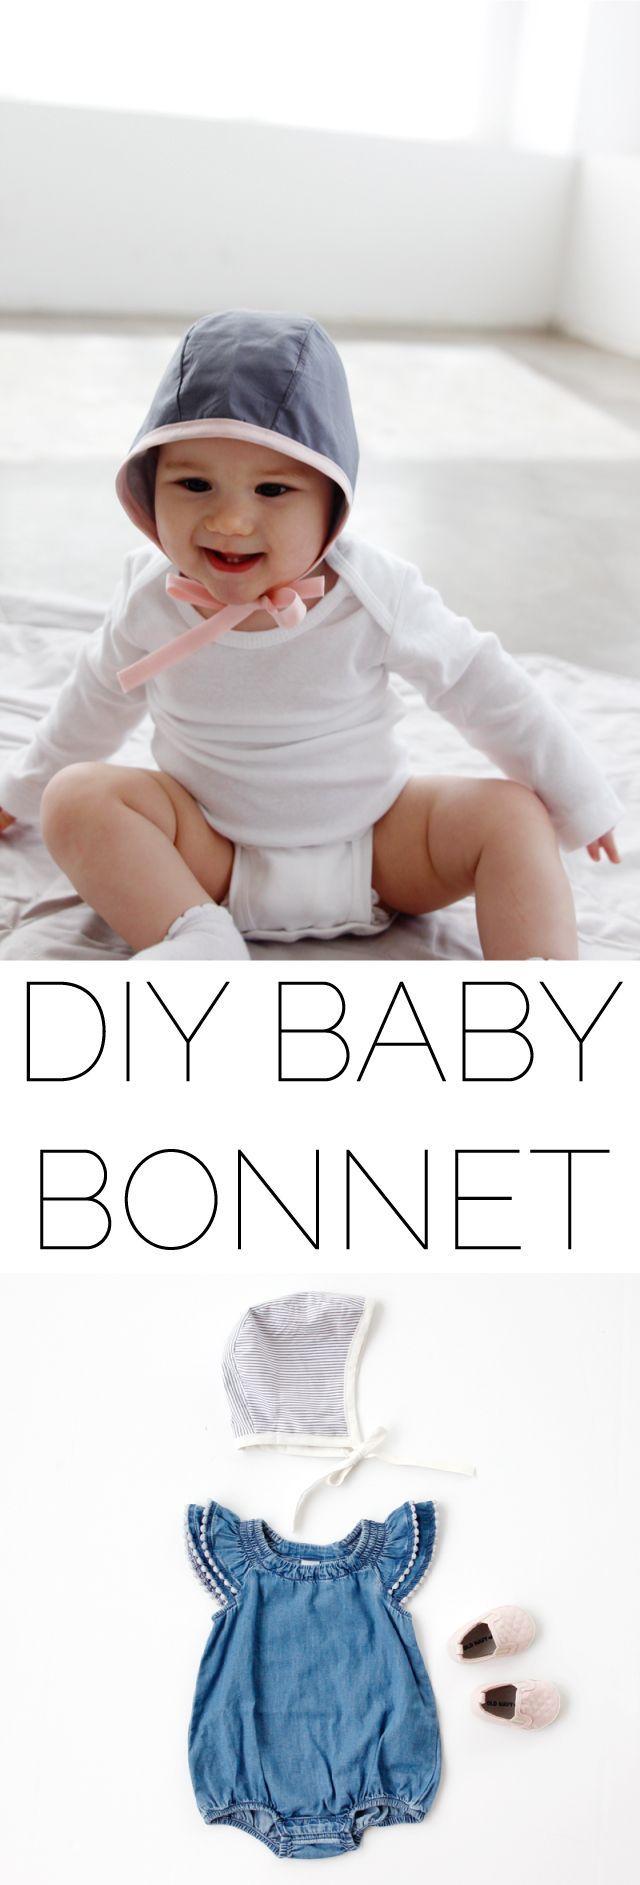 2 New Baby Bonnet Patterns en 2018 | Sewing | Pinterest | Costura ...